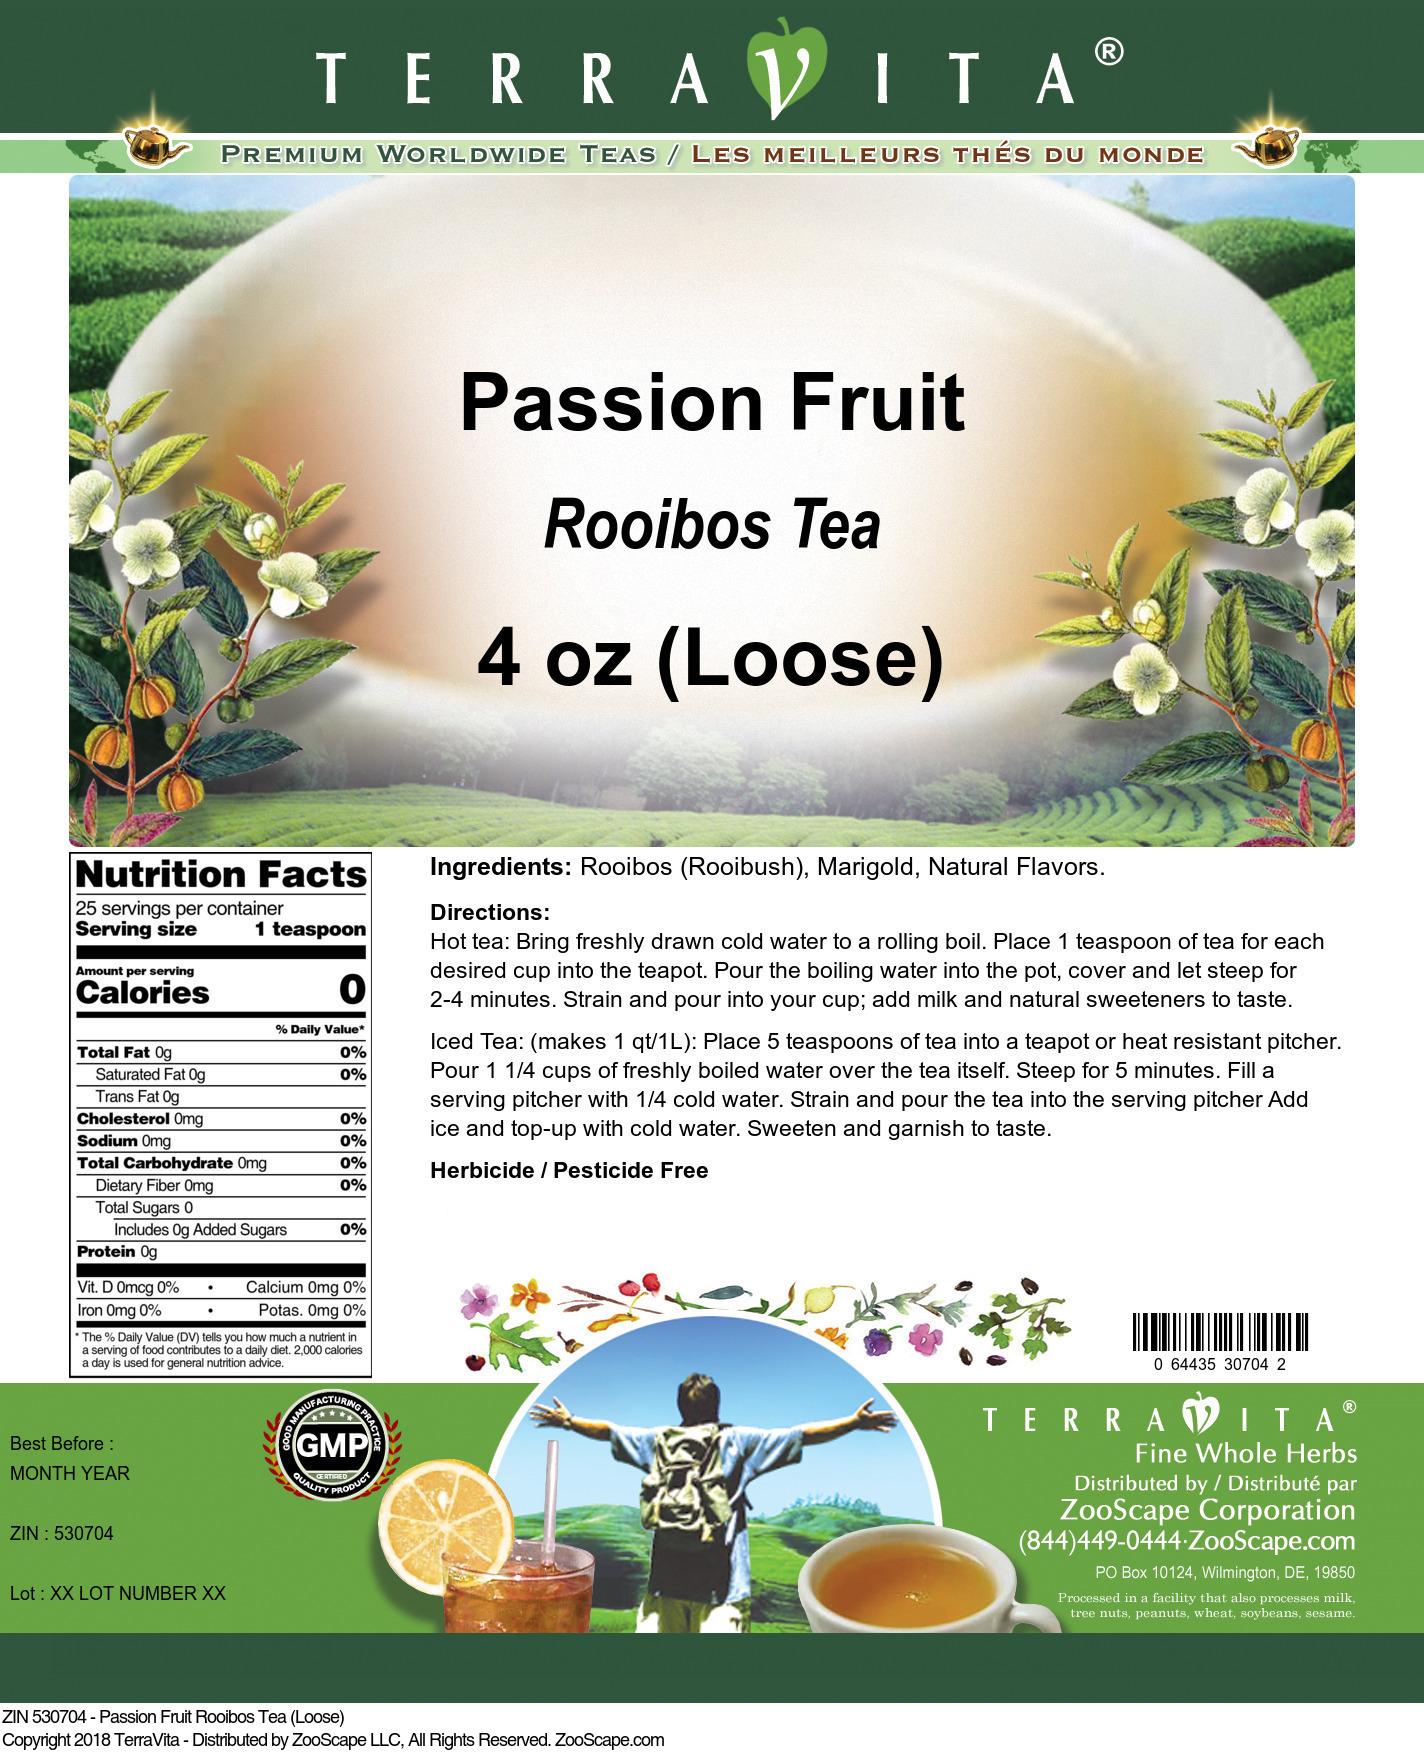 Passion Fruit Rooibos Tea (Loose)